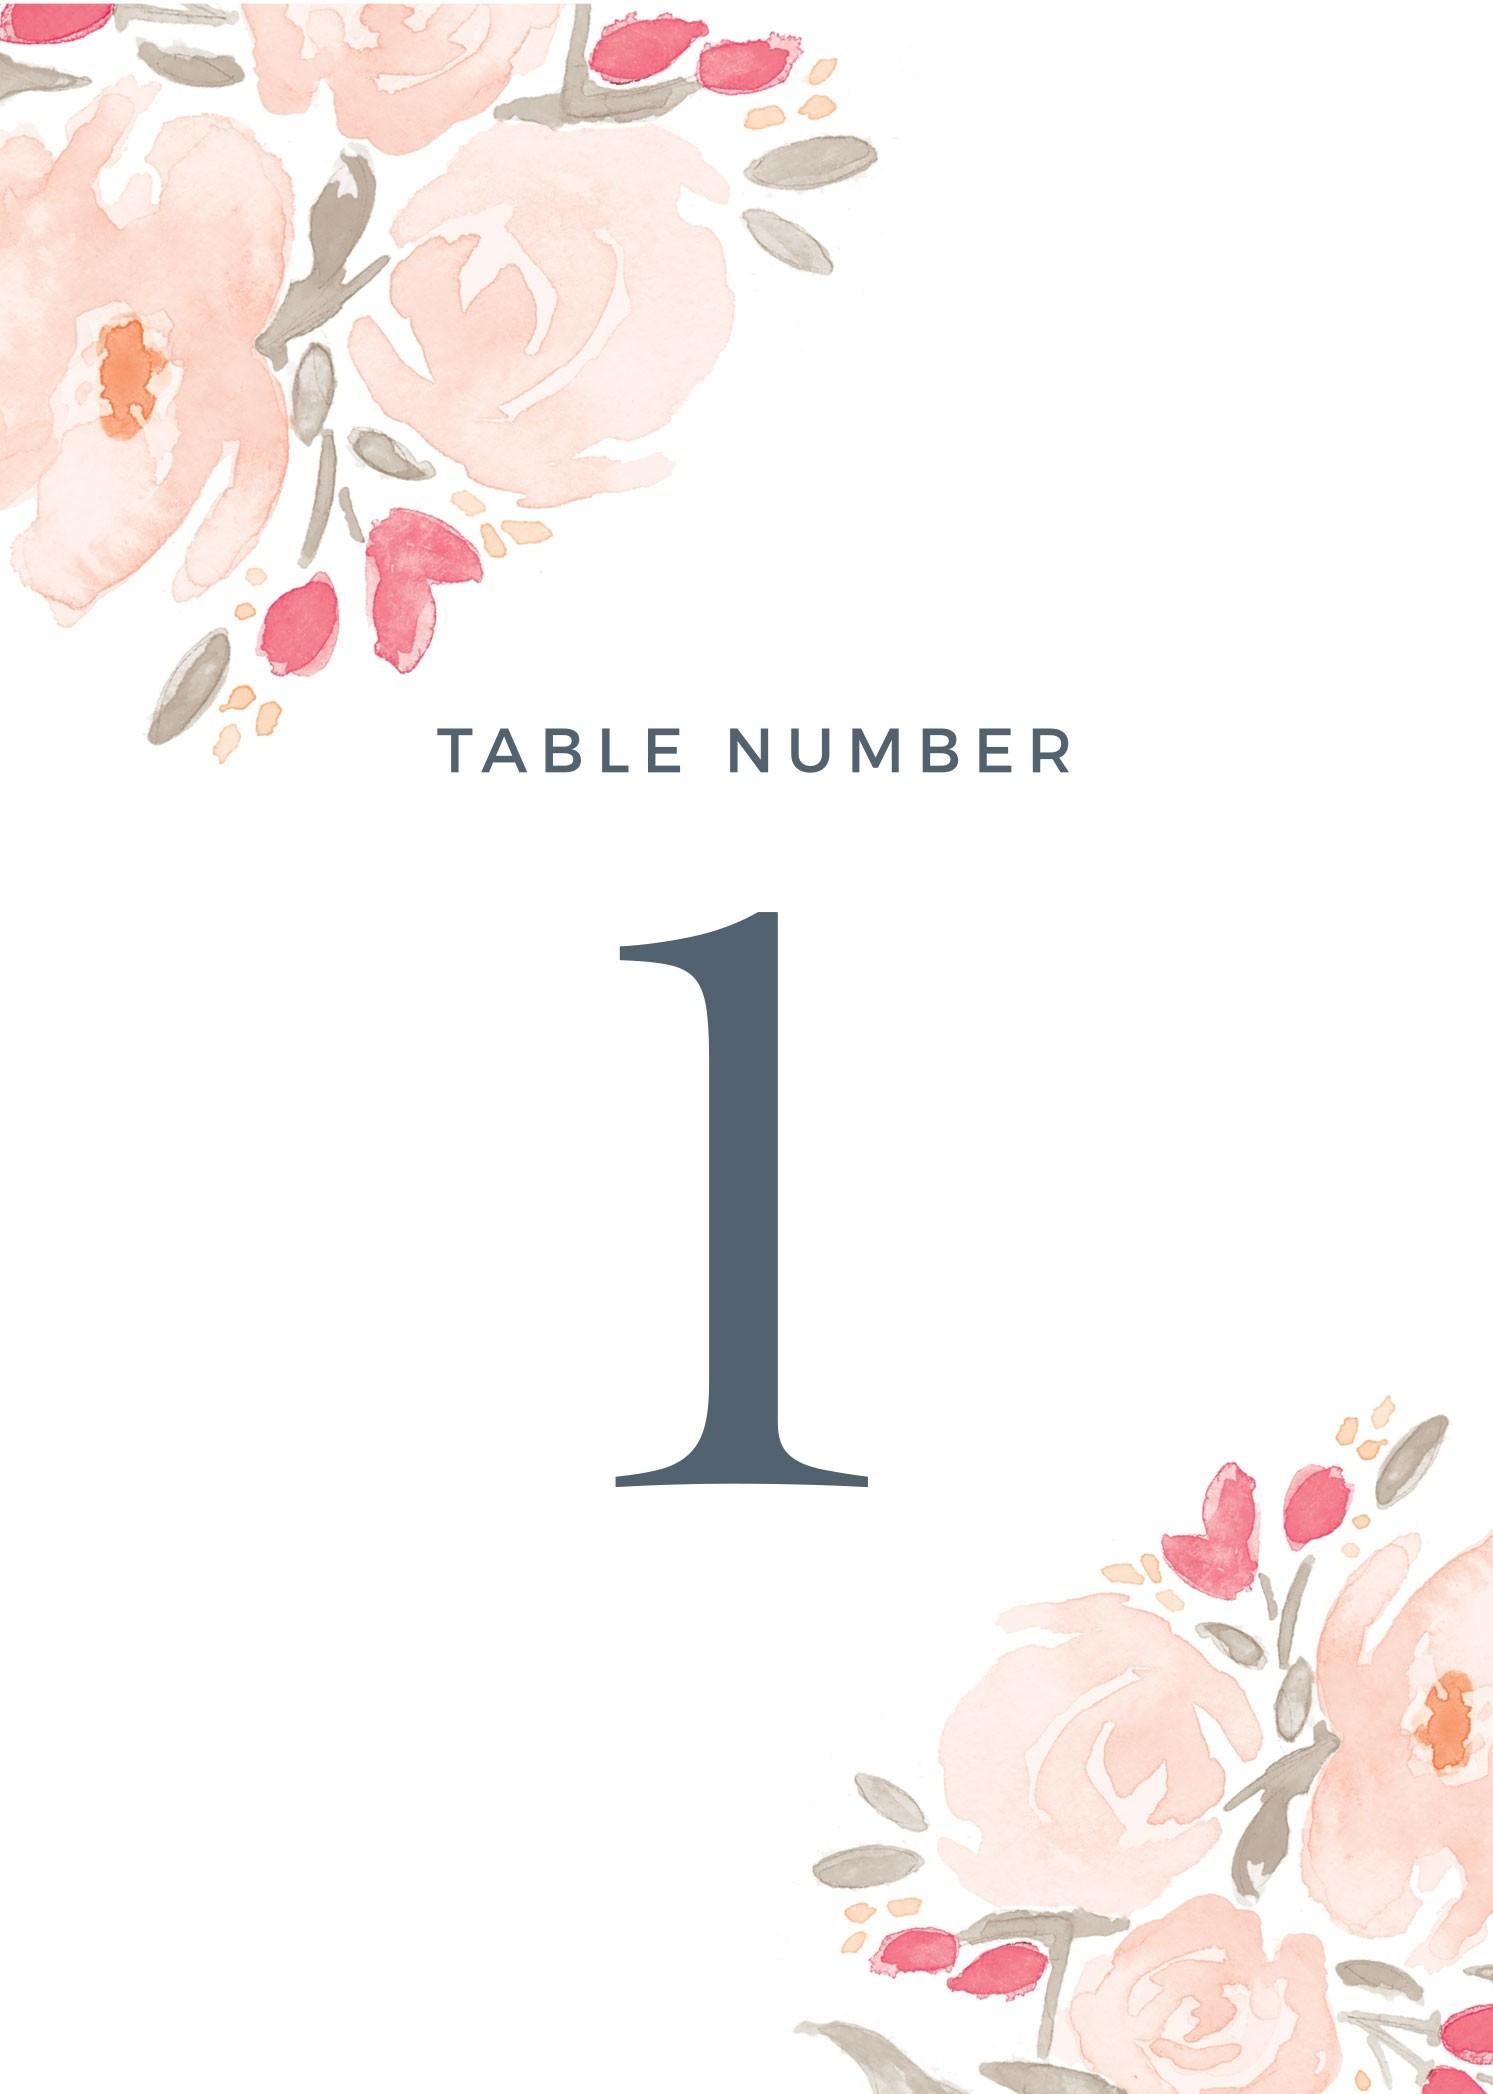 Wedding Table Numbers   Printable Pdfbasic Invite - Free Printable Table Numbers